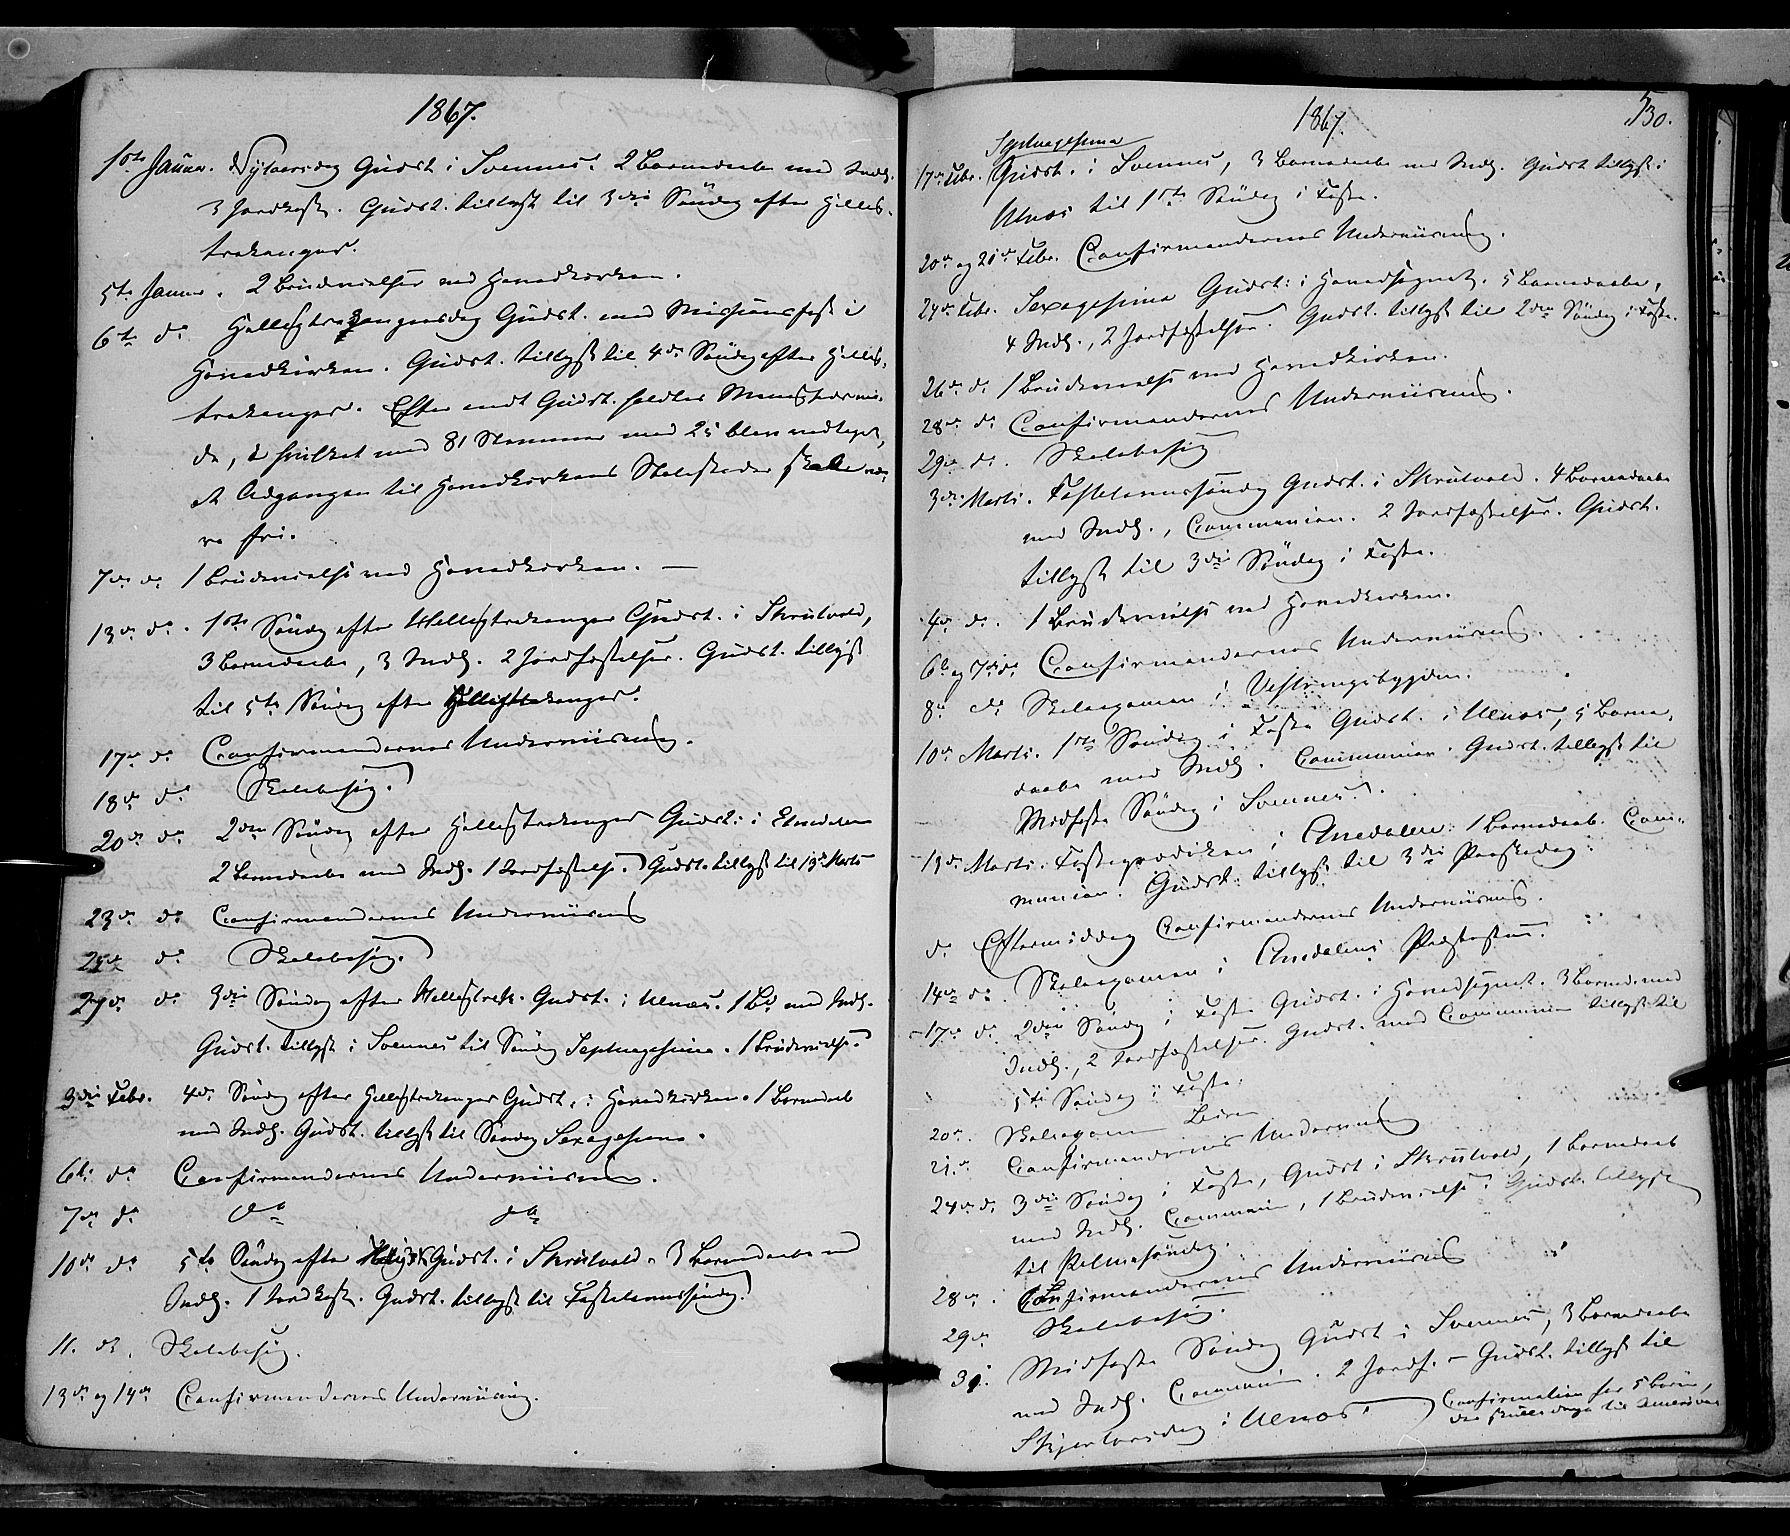 SAH, Nord-Aurdal prestekontor, Ministerialbok nr. 8, 1863-1875, s. 530